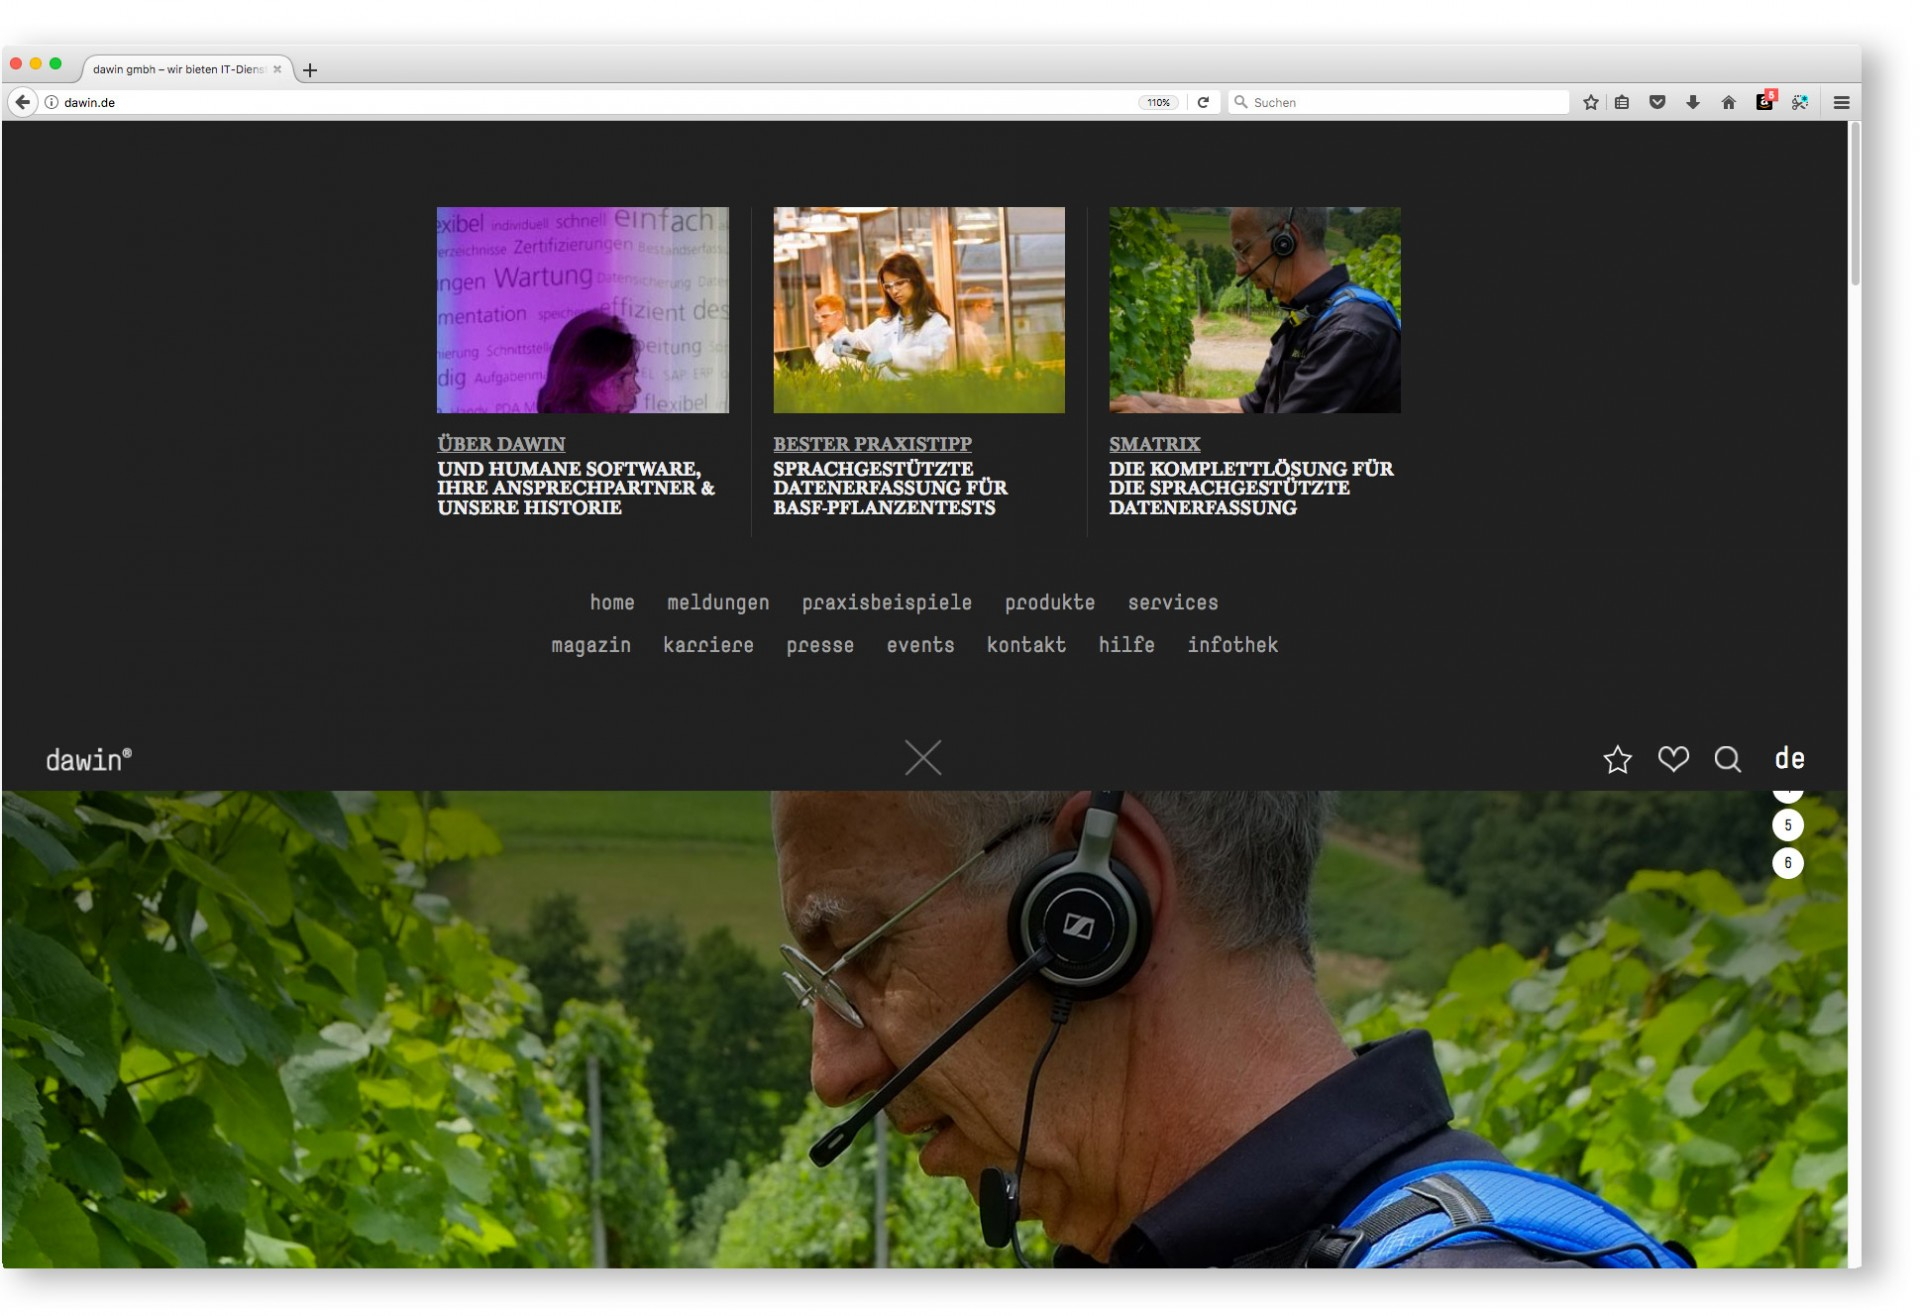 BUREAU KUEPPERS Corporate Website für dawin gmbh